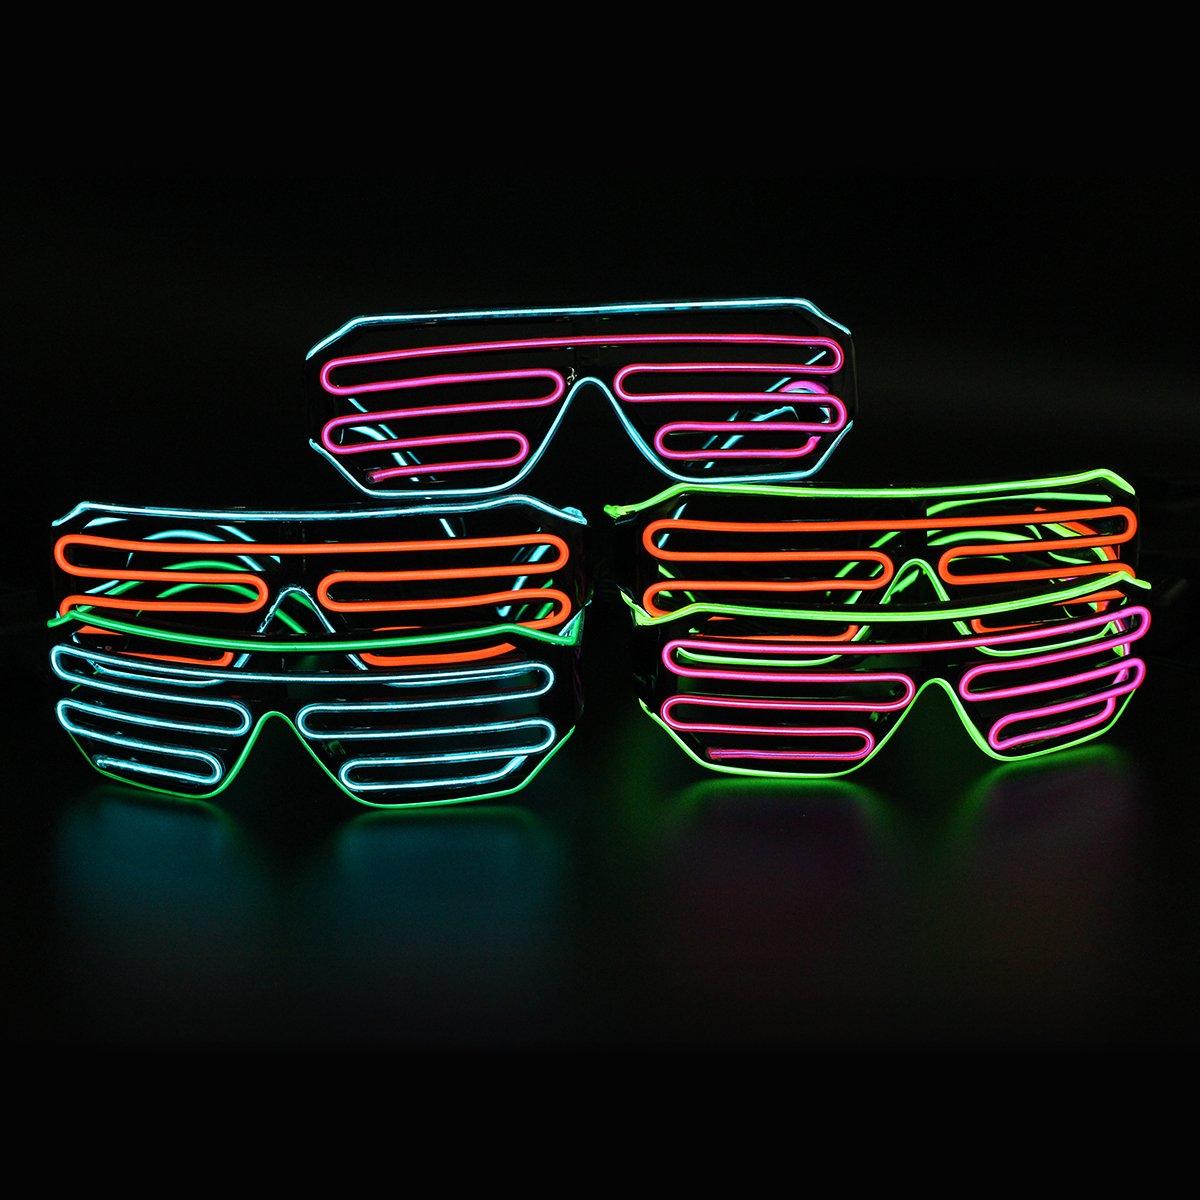 LED-Glas-Partei, Standardsteuer-Neon-El-Draht LED leuchten bunten ...